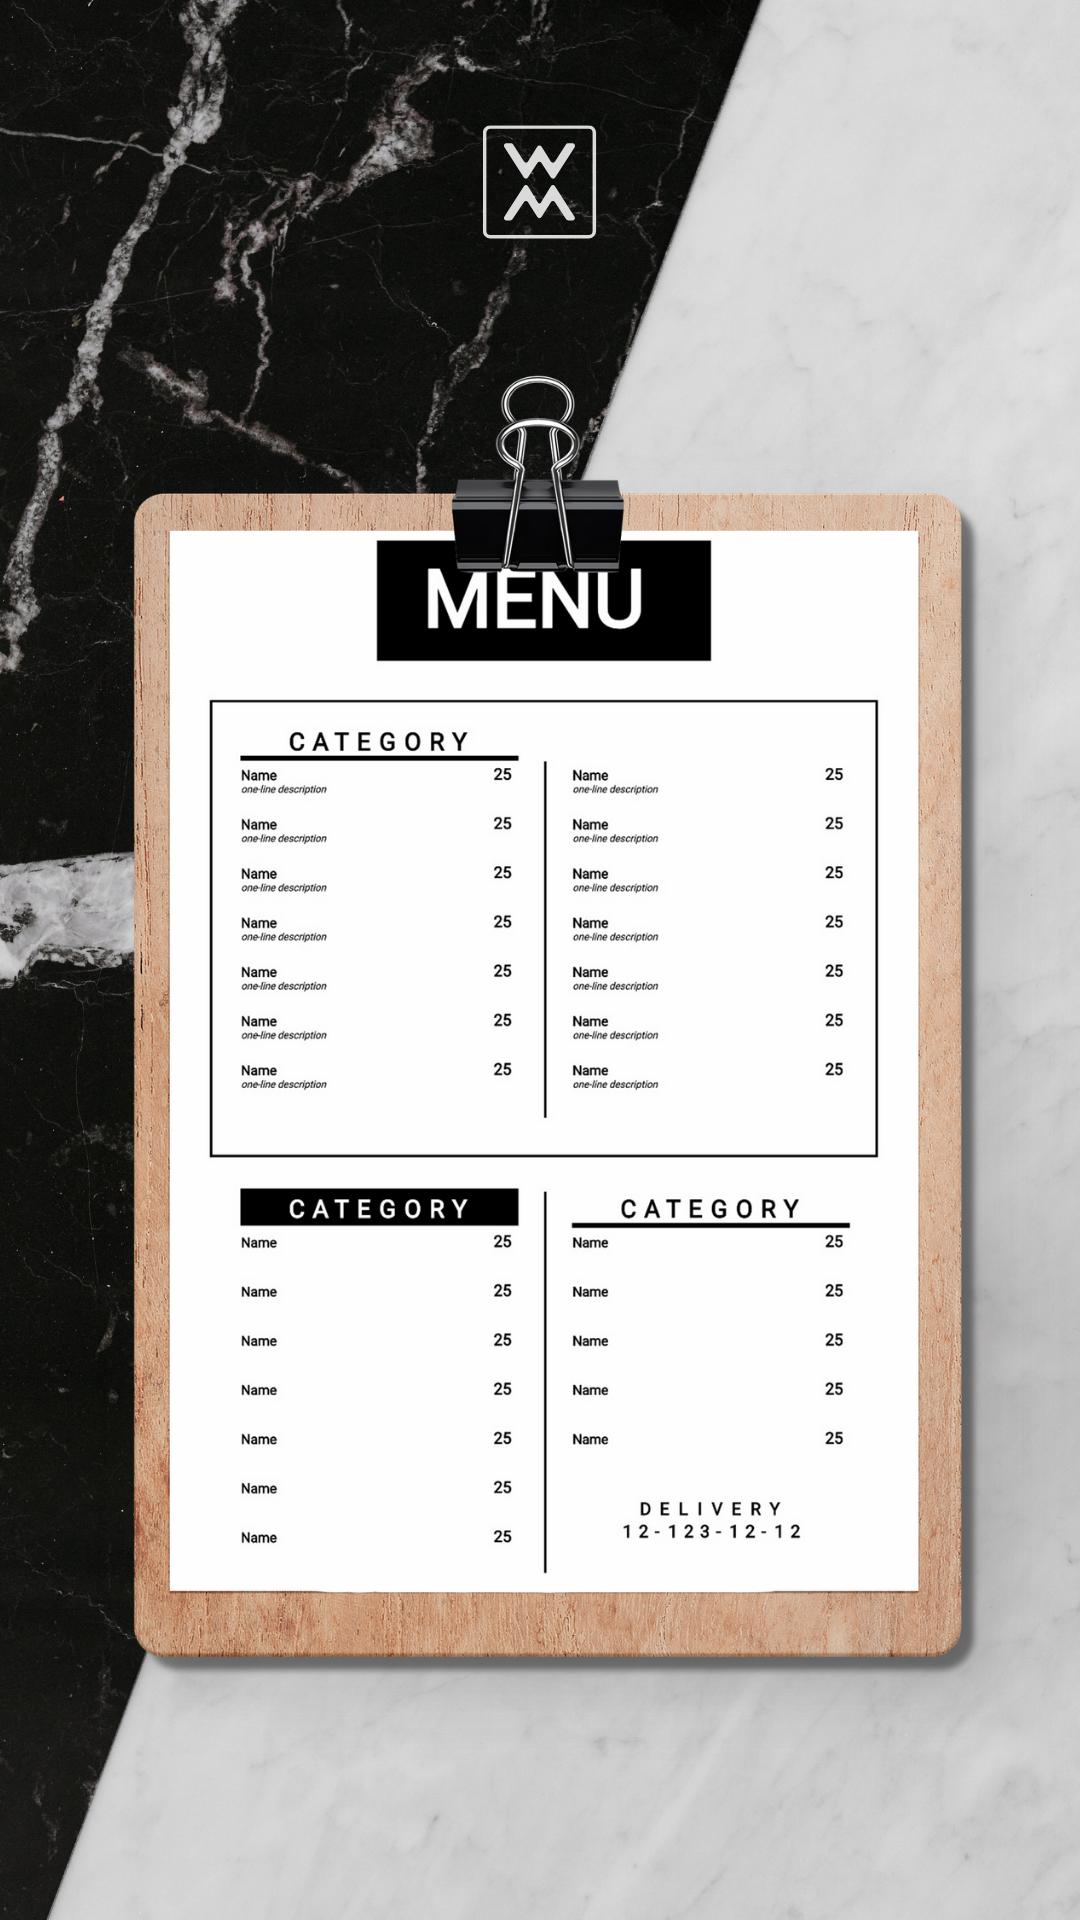 шаблон меню ресторана word